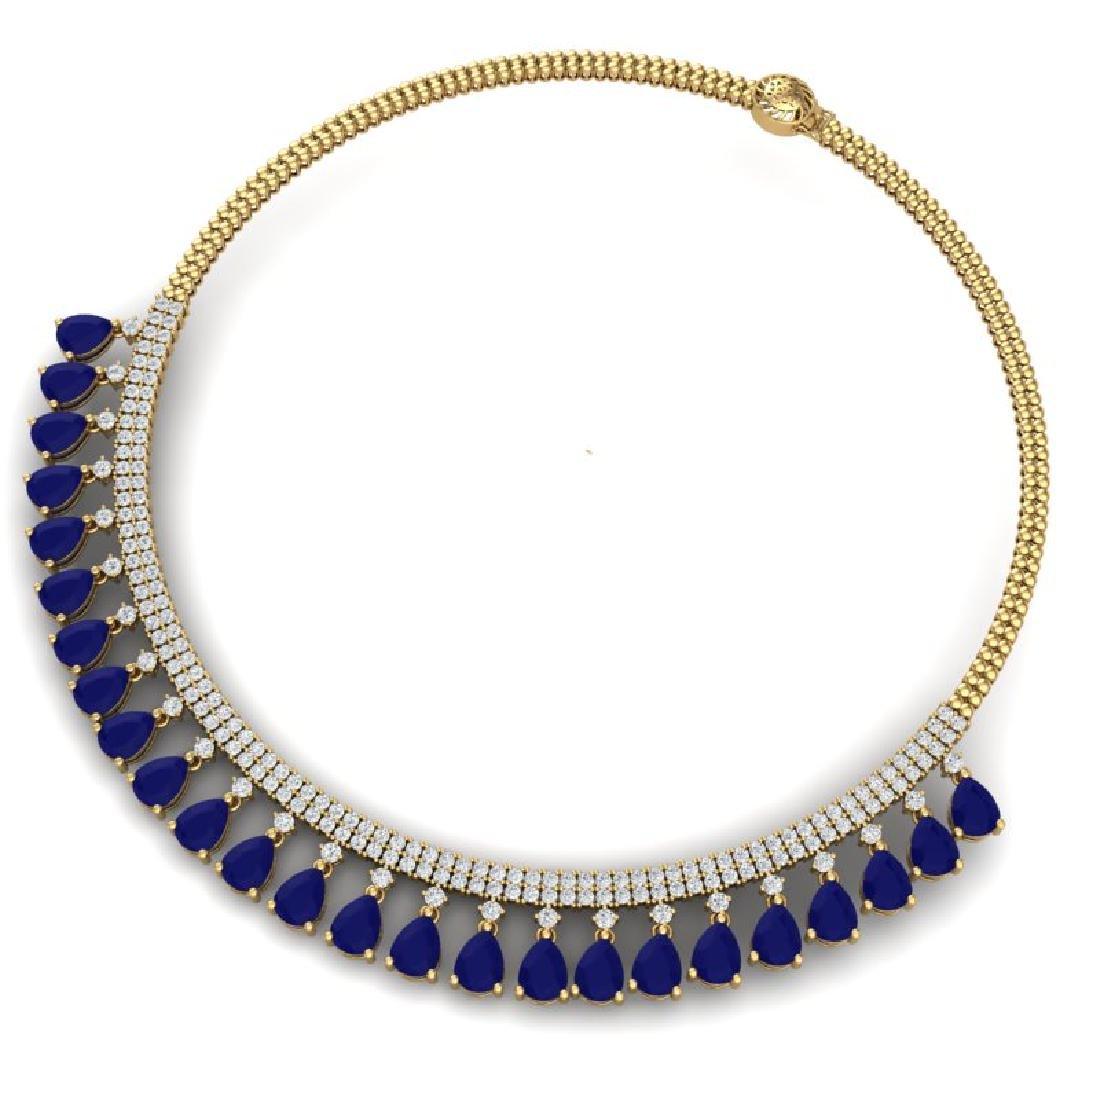 51.75 CTW Royalty Sapphire & VS Diamond Necklace 18K - 2